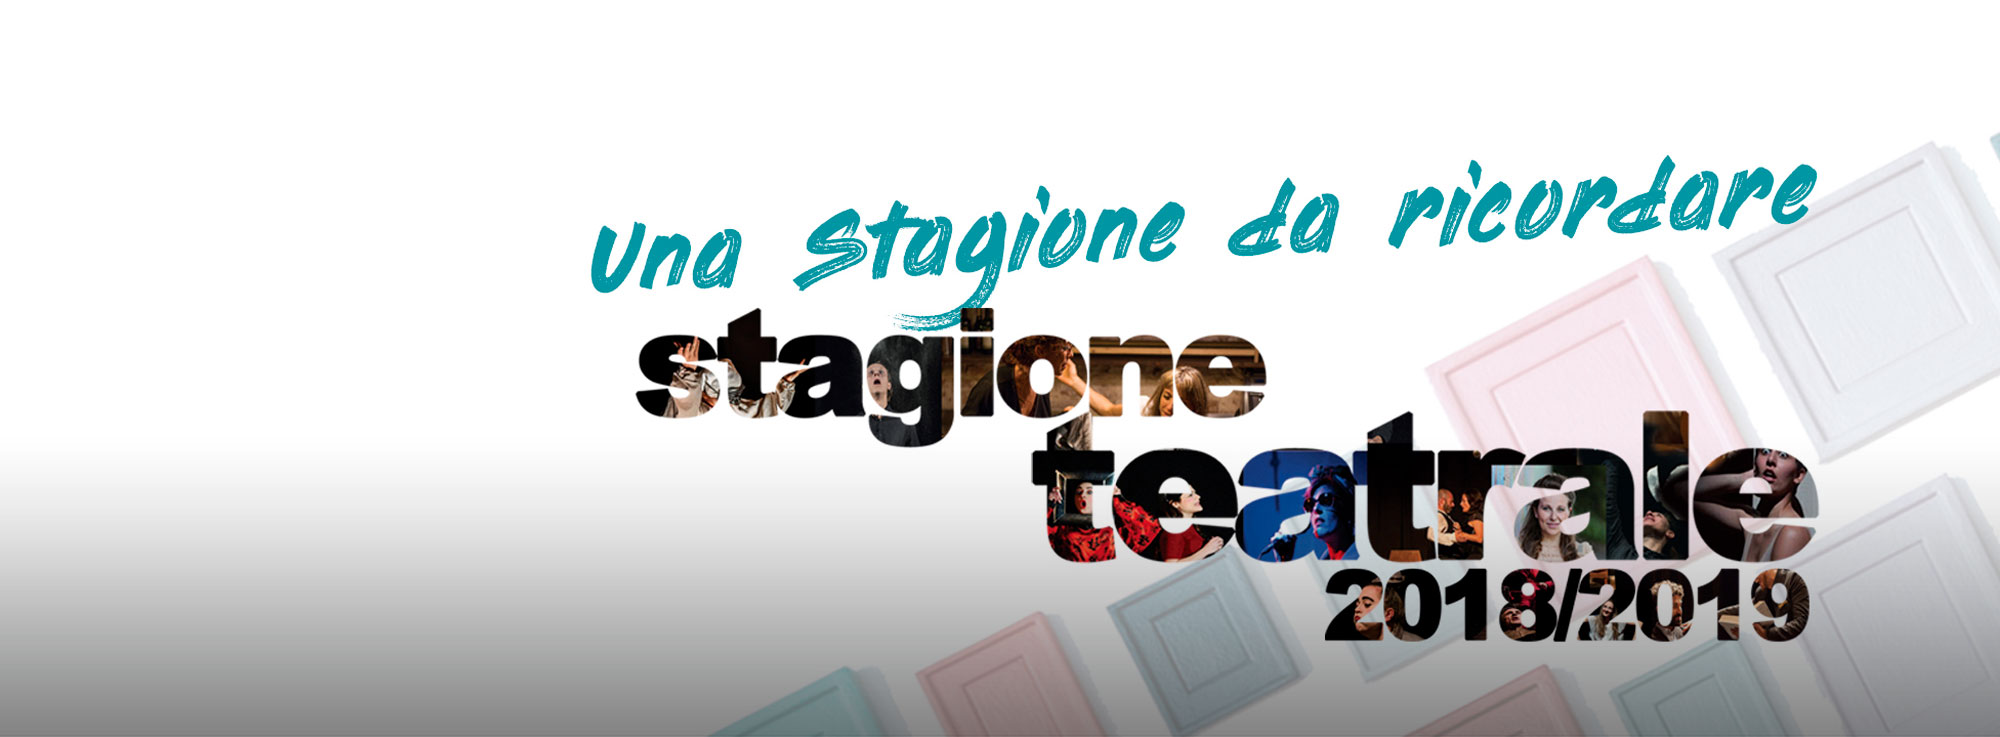 Brindisi: Rassegna teatrale 2018-2019